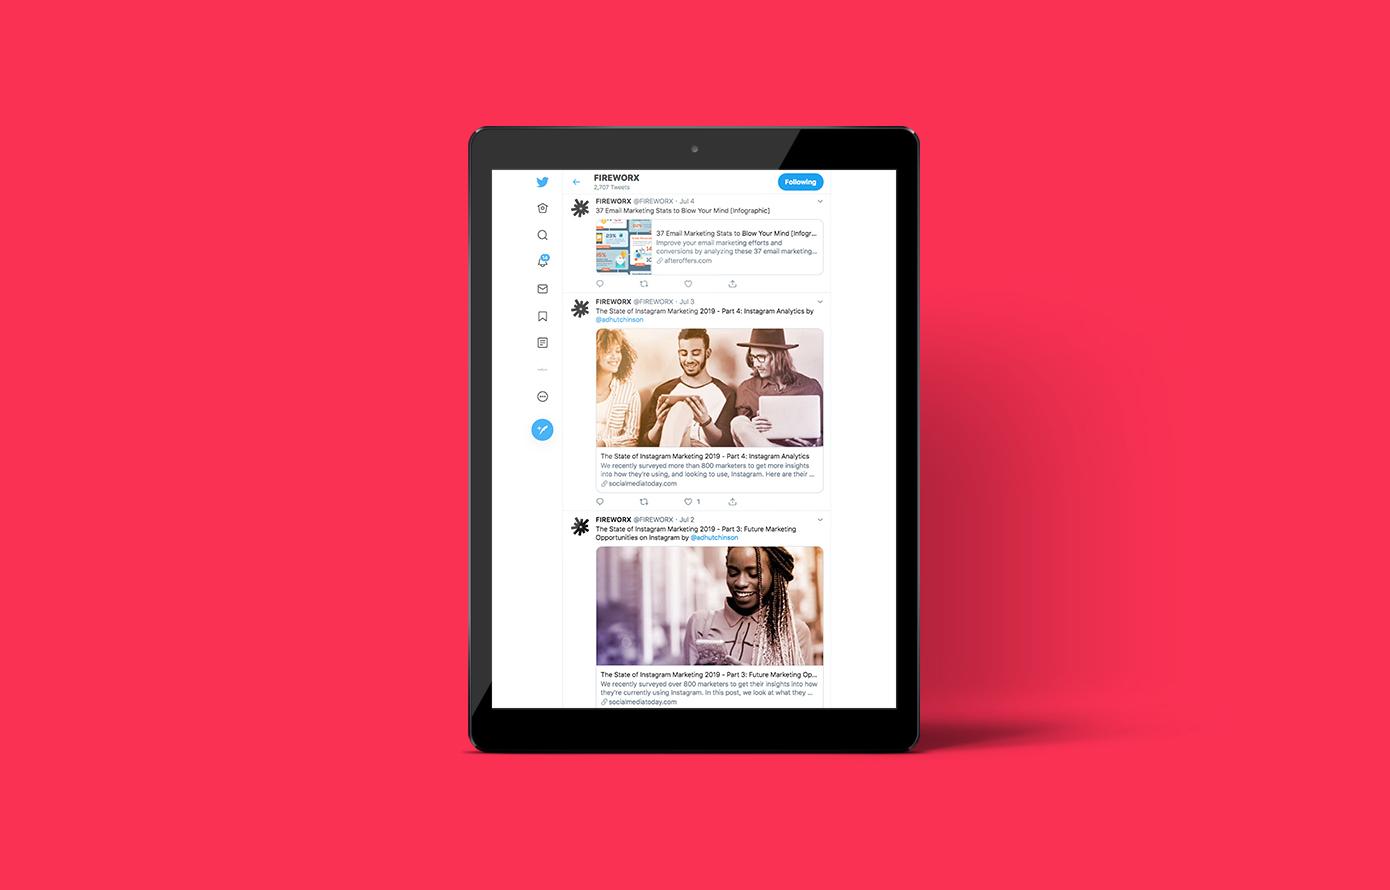 Fireworx Social Media Twitter Service iPad screen